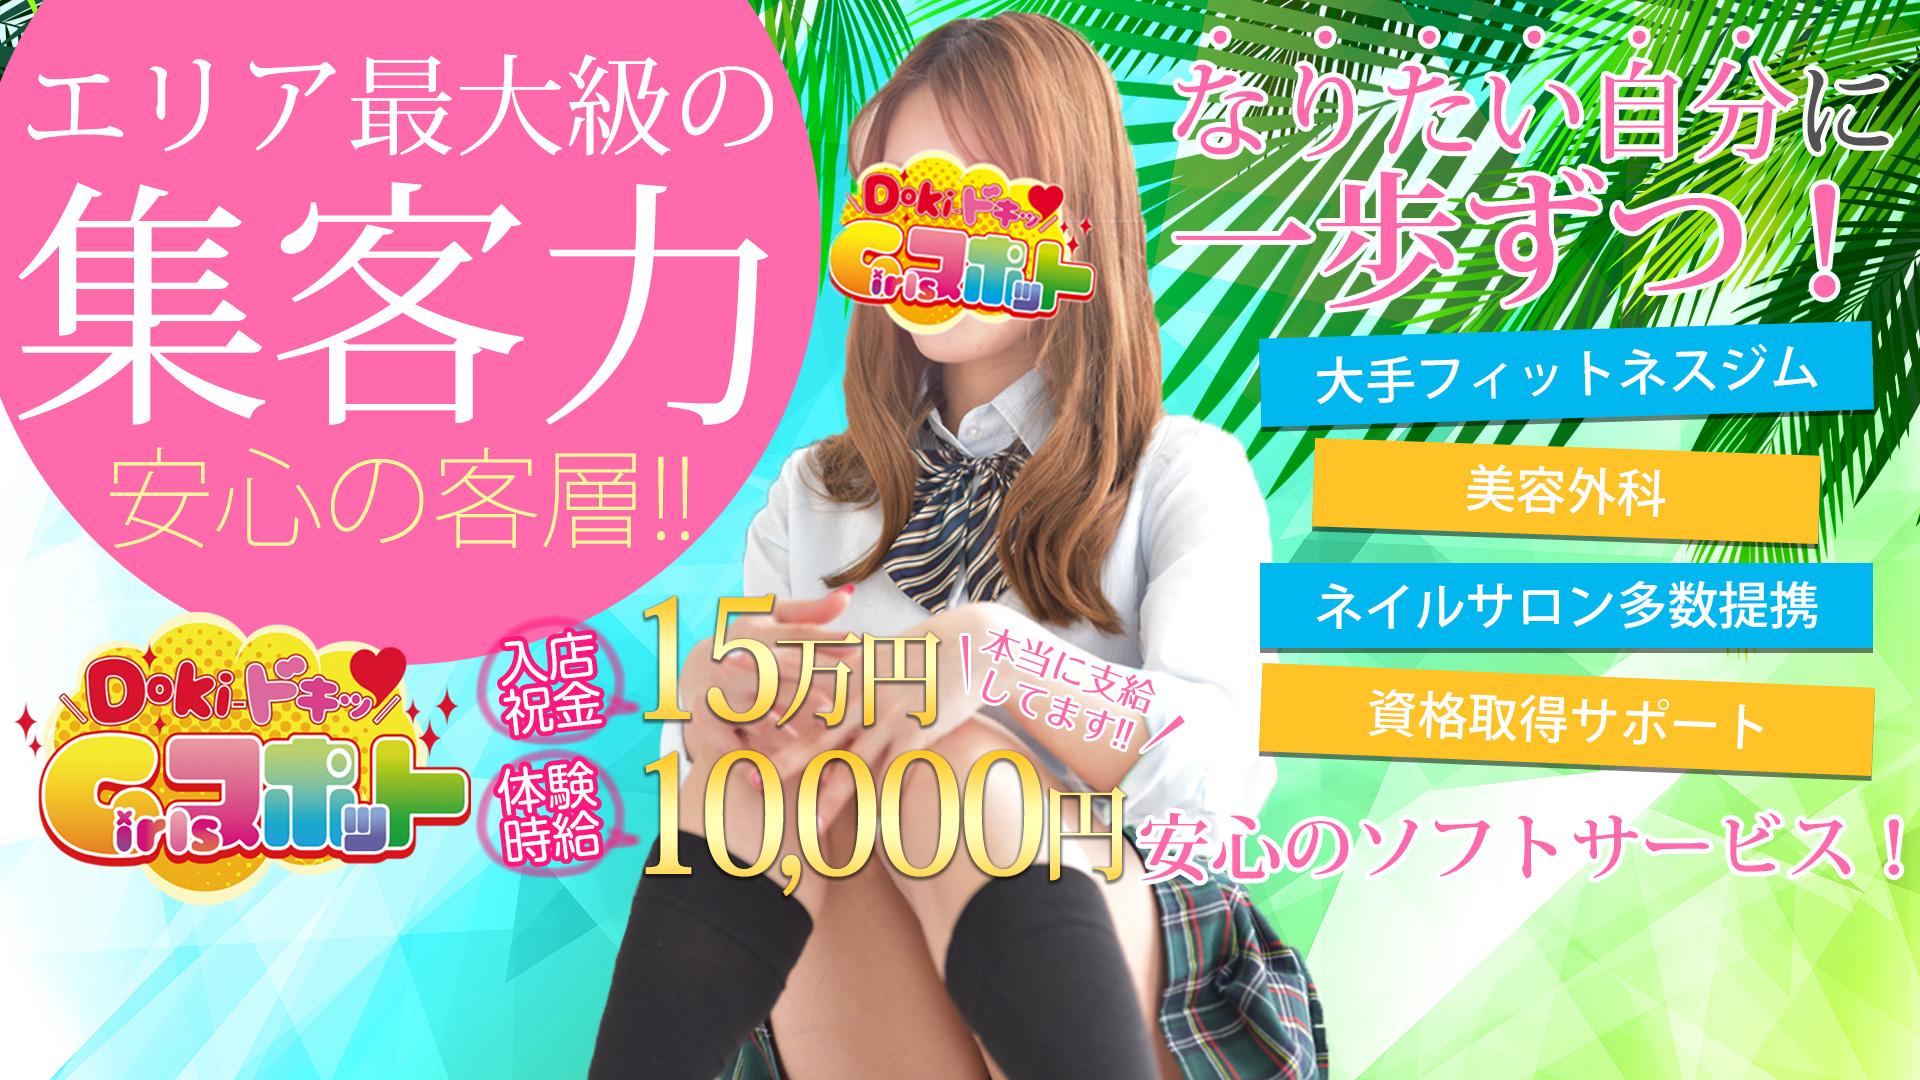 Doki-ドキッ Girlsスポットの求人画像